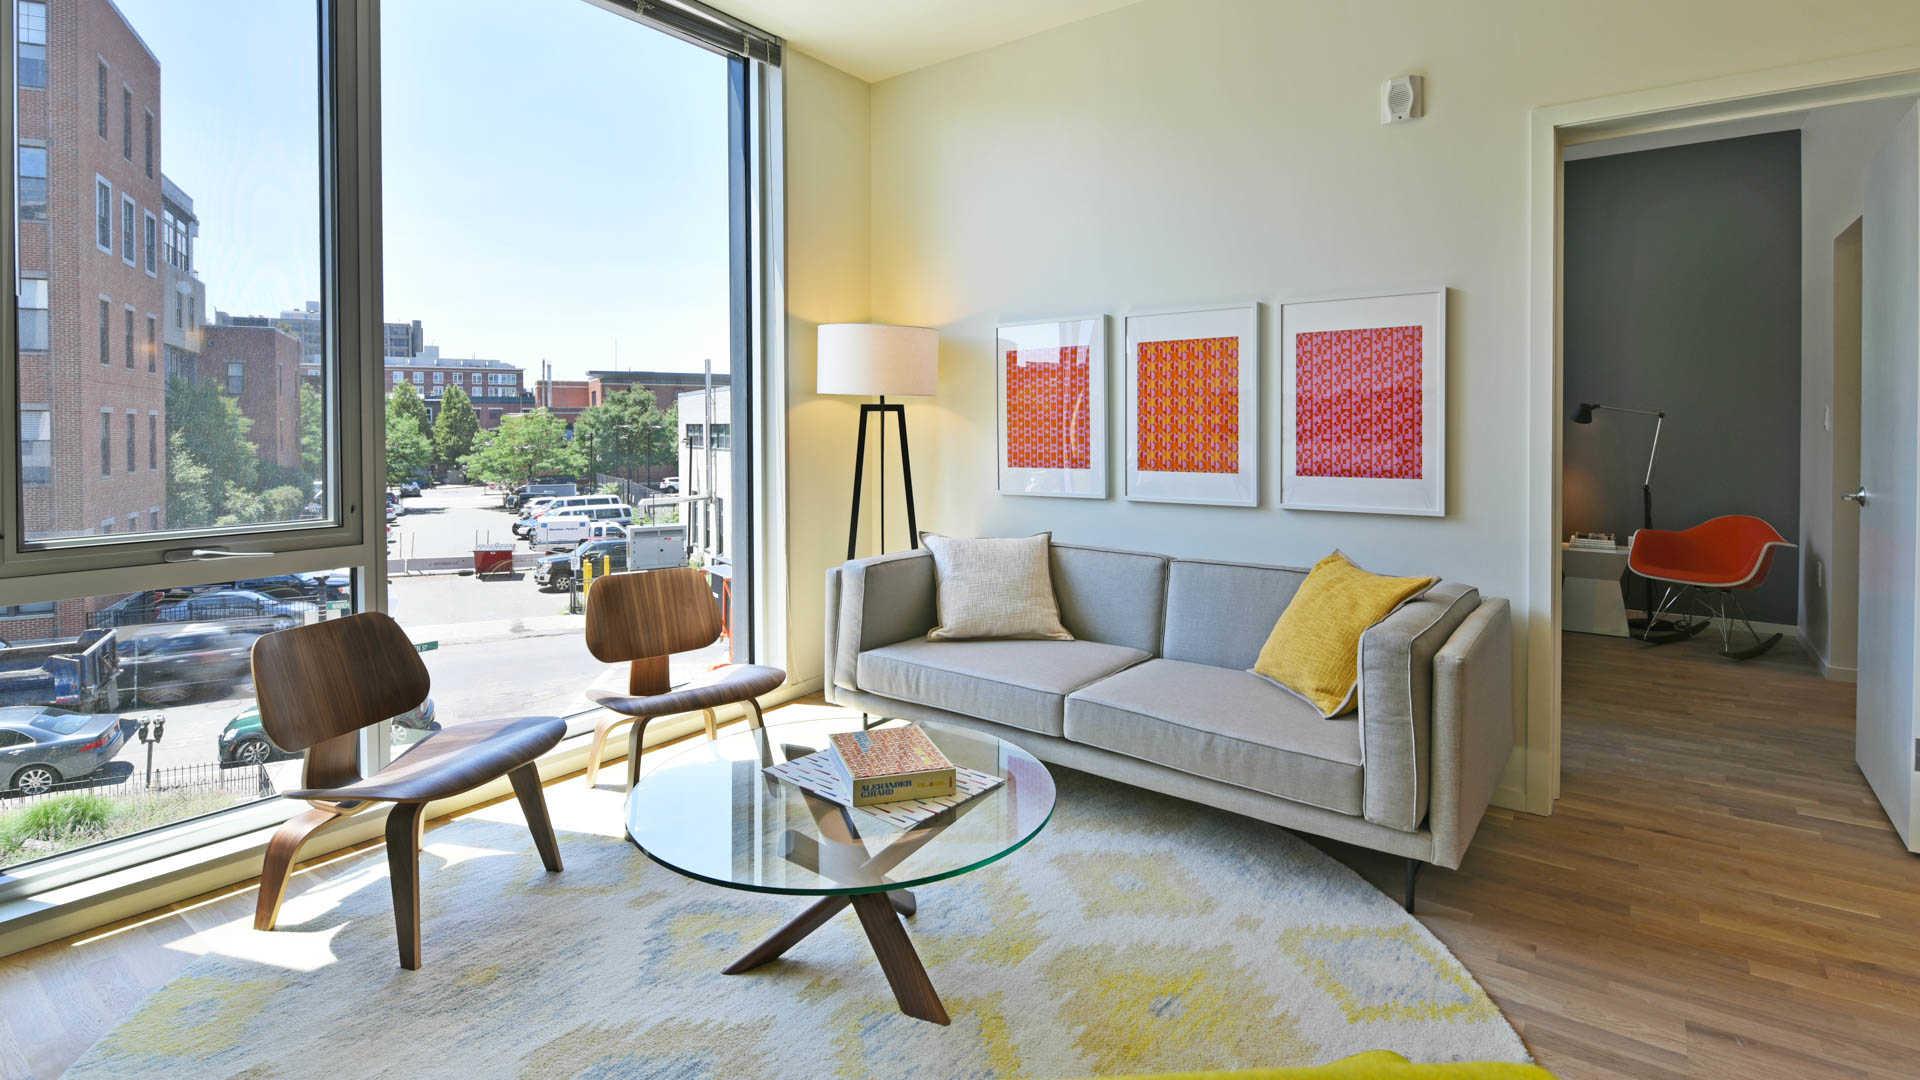 Girard apartments living room